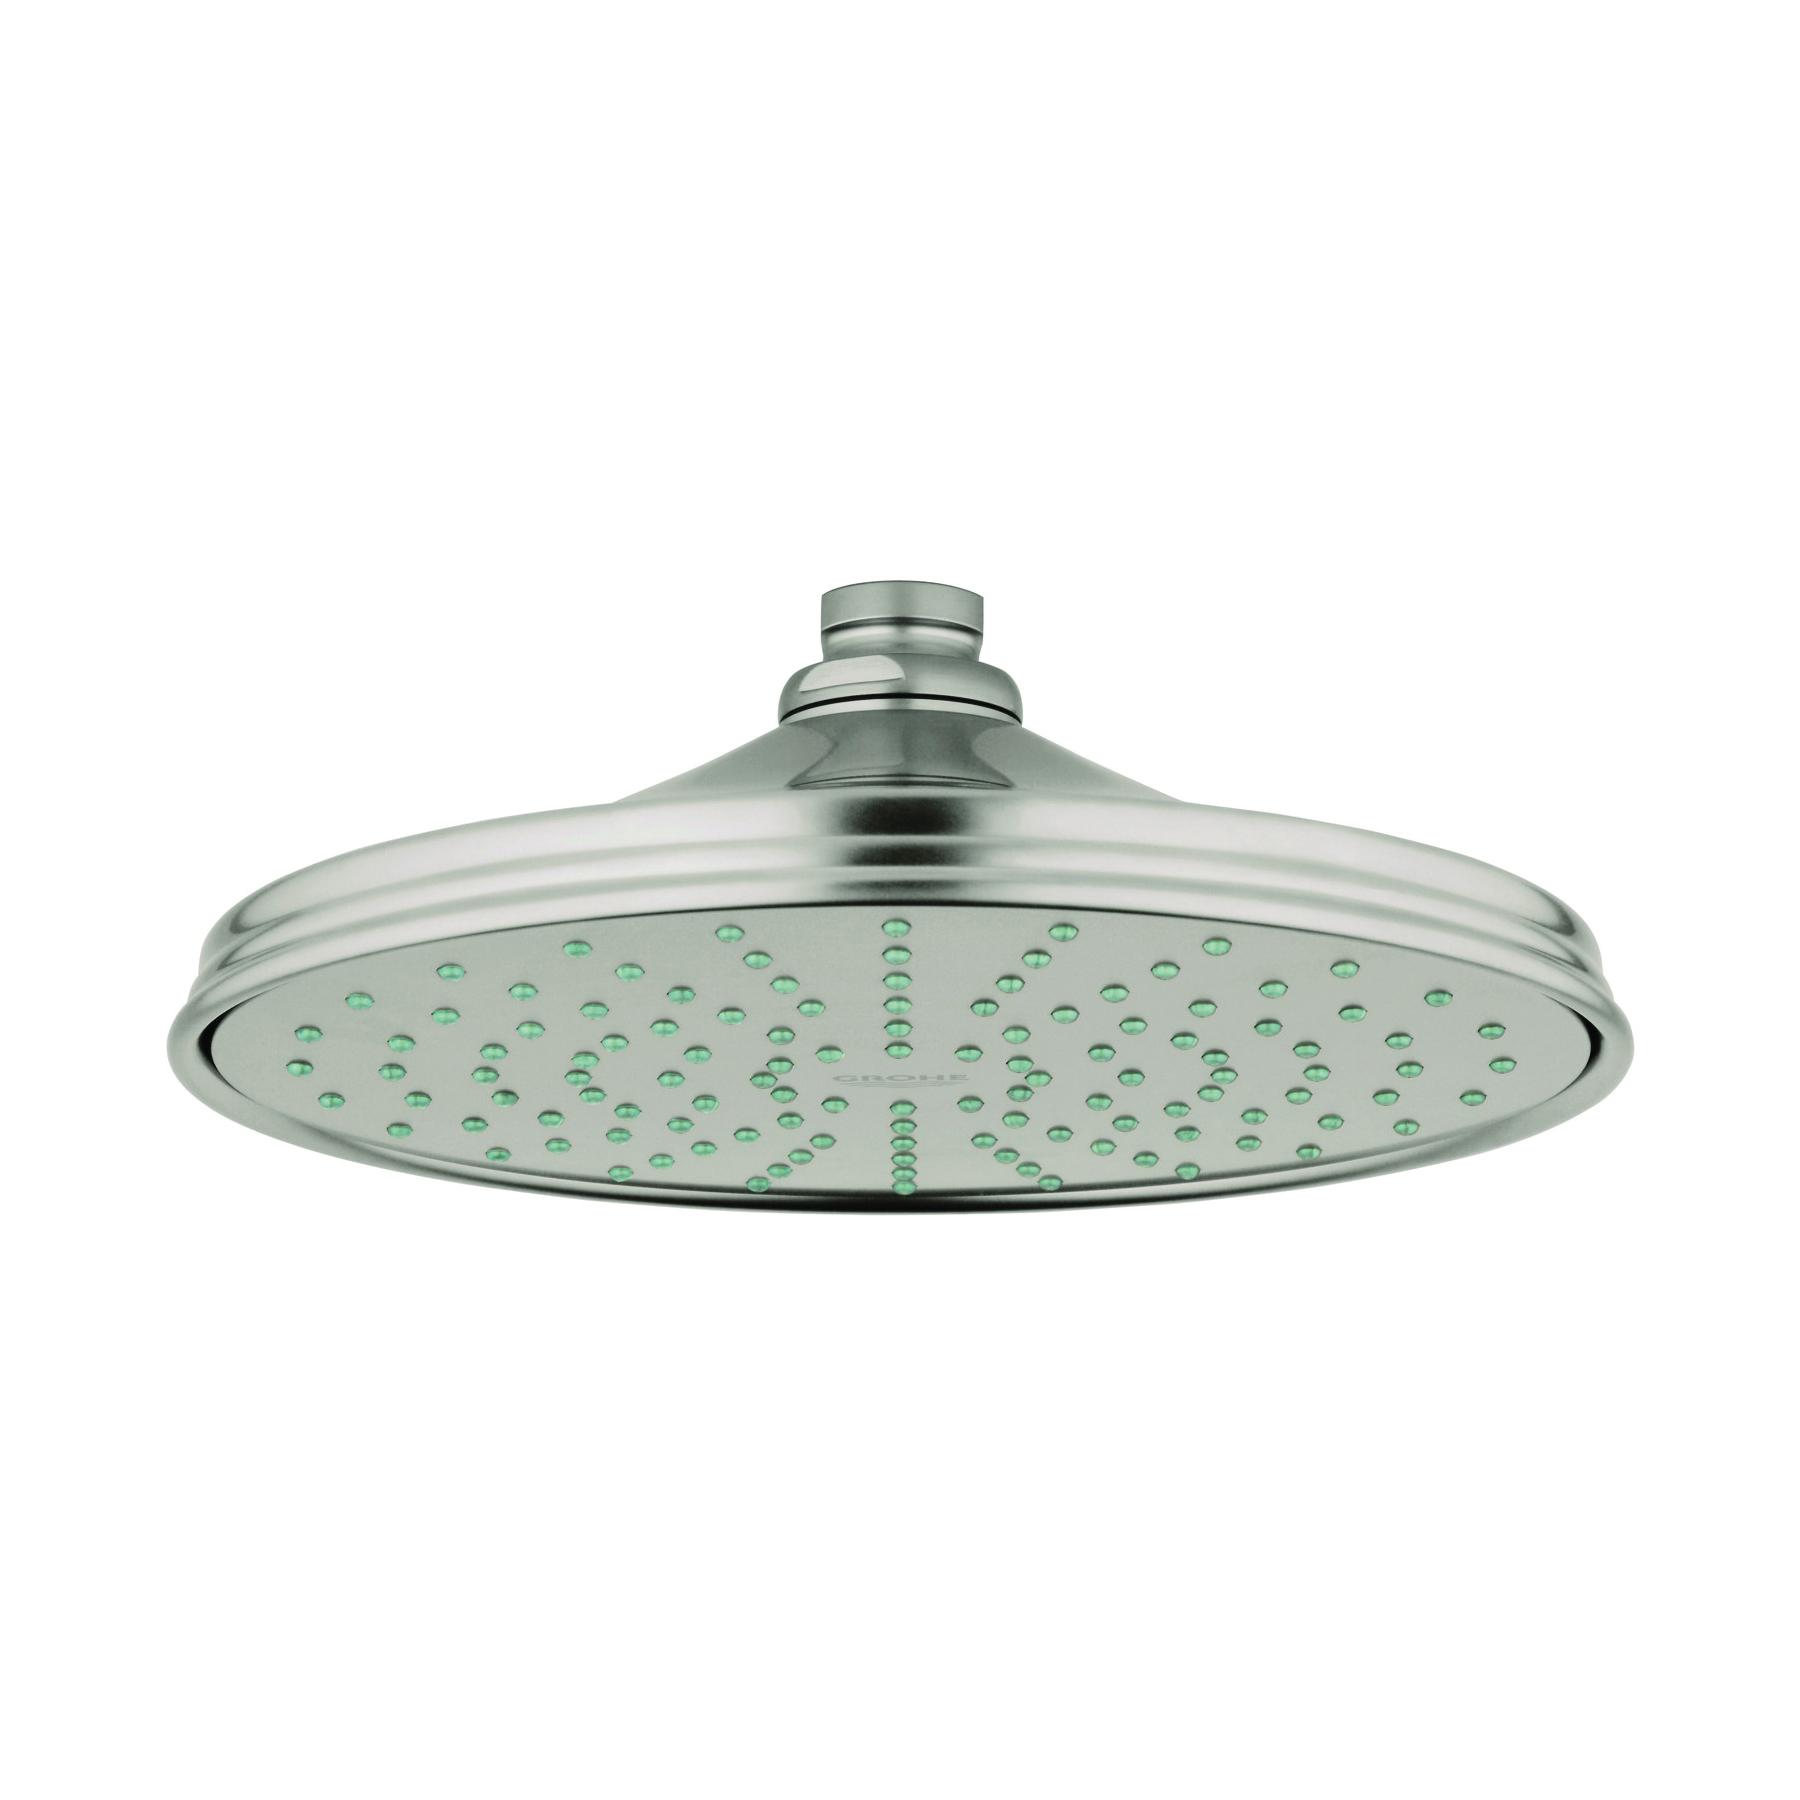 GROHE 28375EN0 Rainshower® Rustic 210 Shower Head, 2.5 gpm, 1 Spray, Ceiling Mount, 8-3/8 in Dia Head, Import